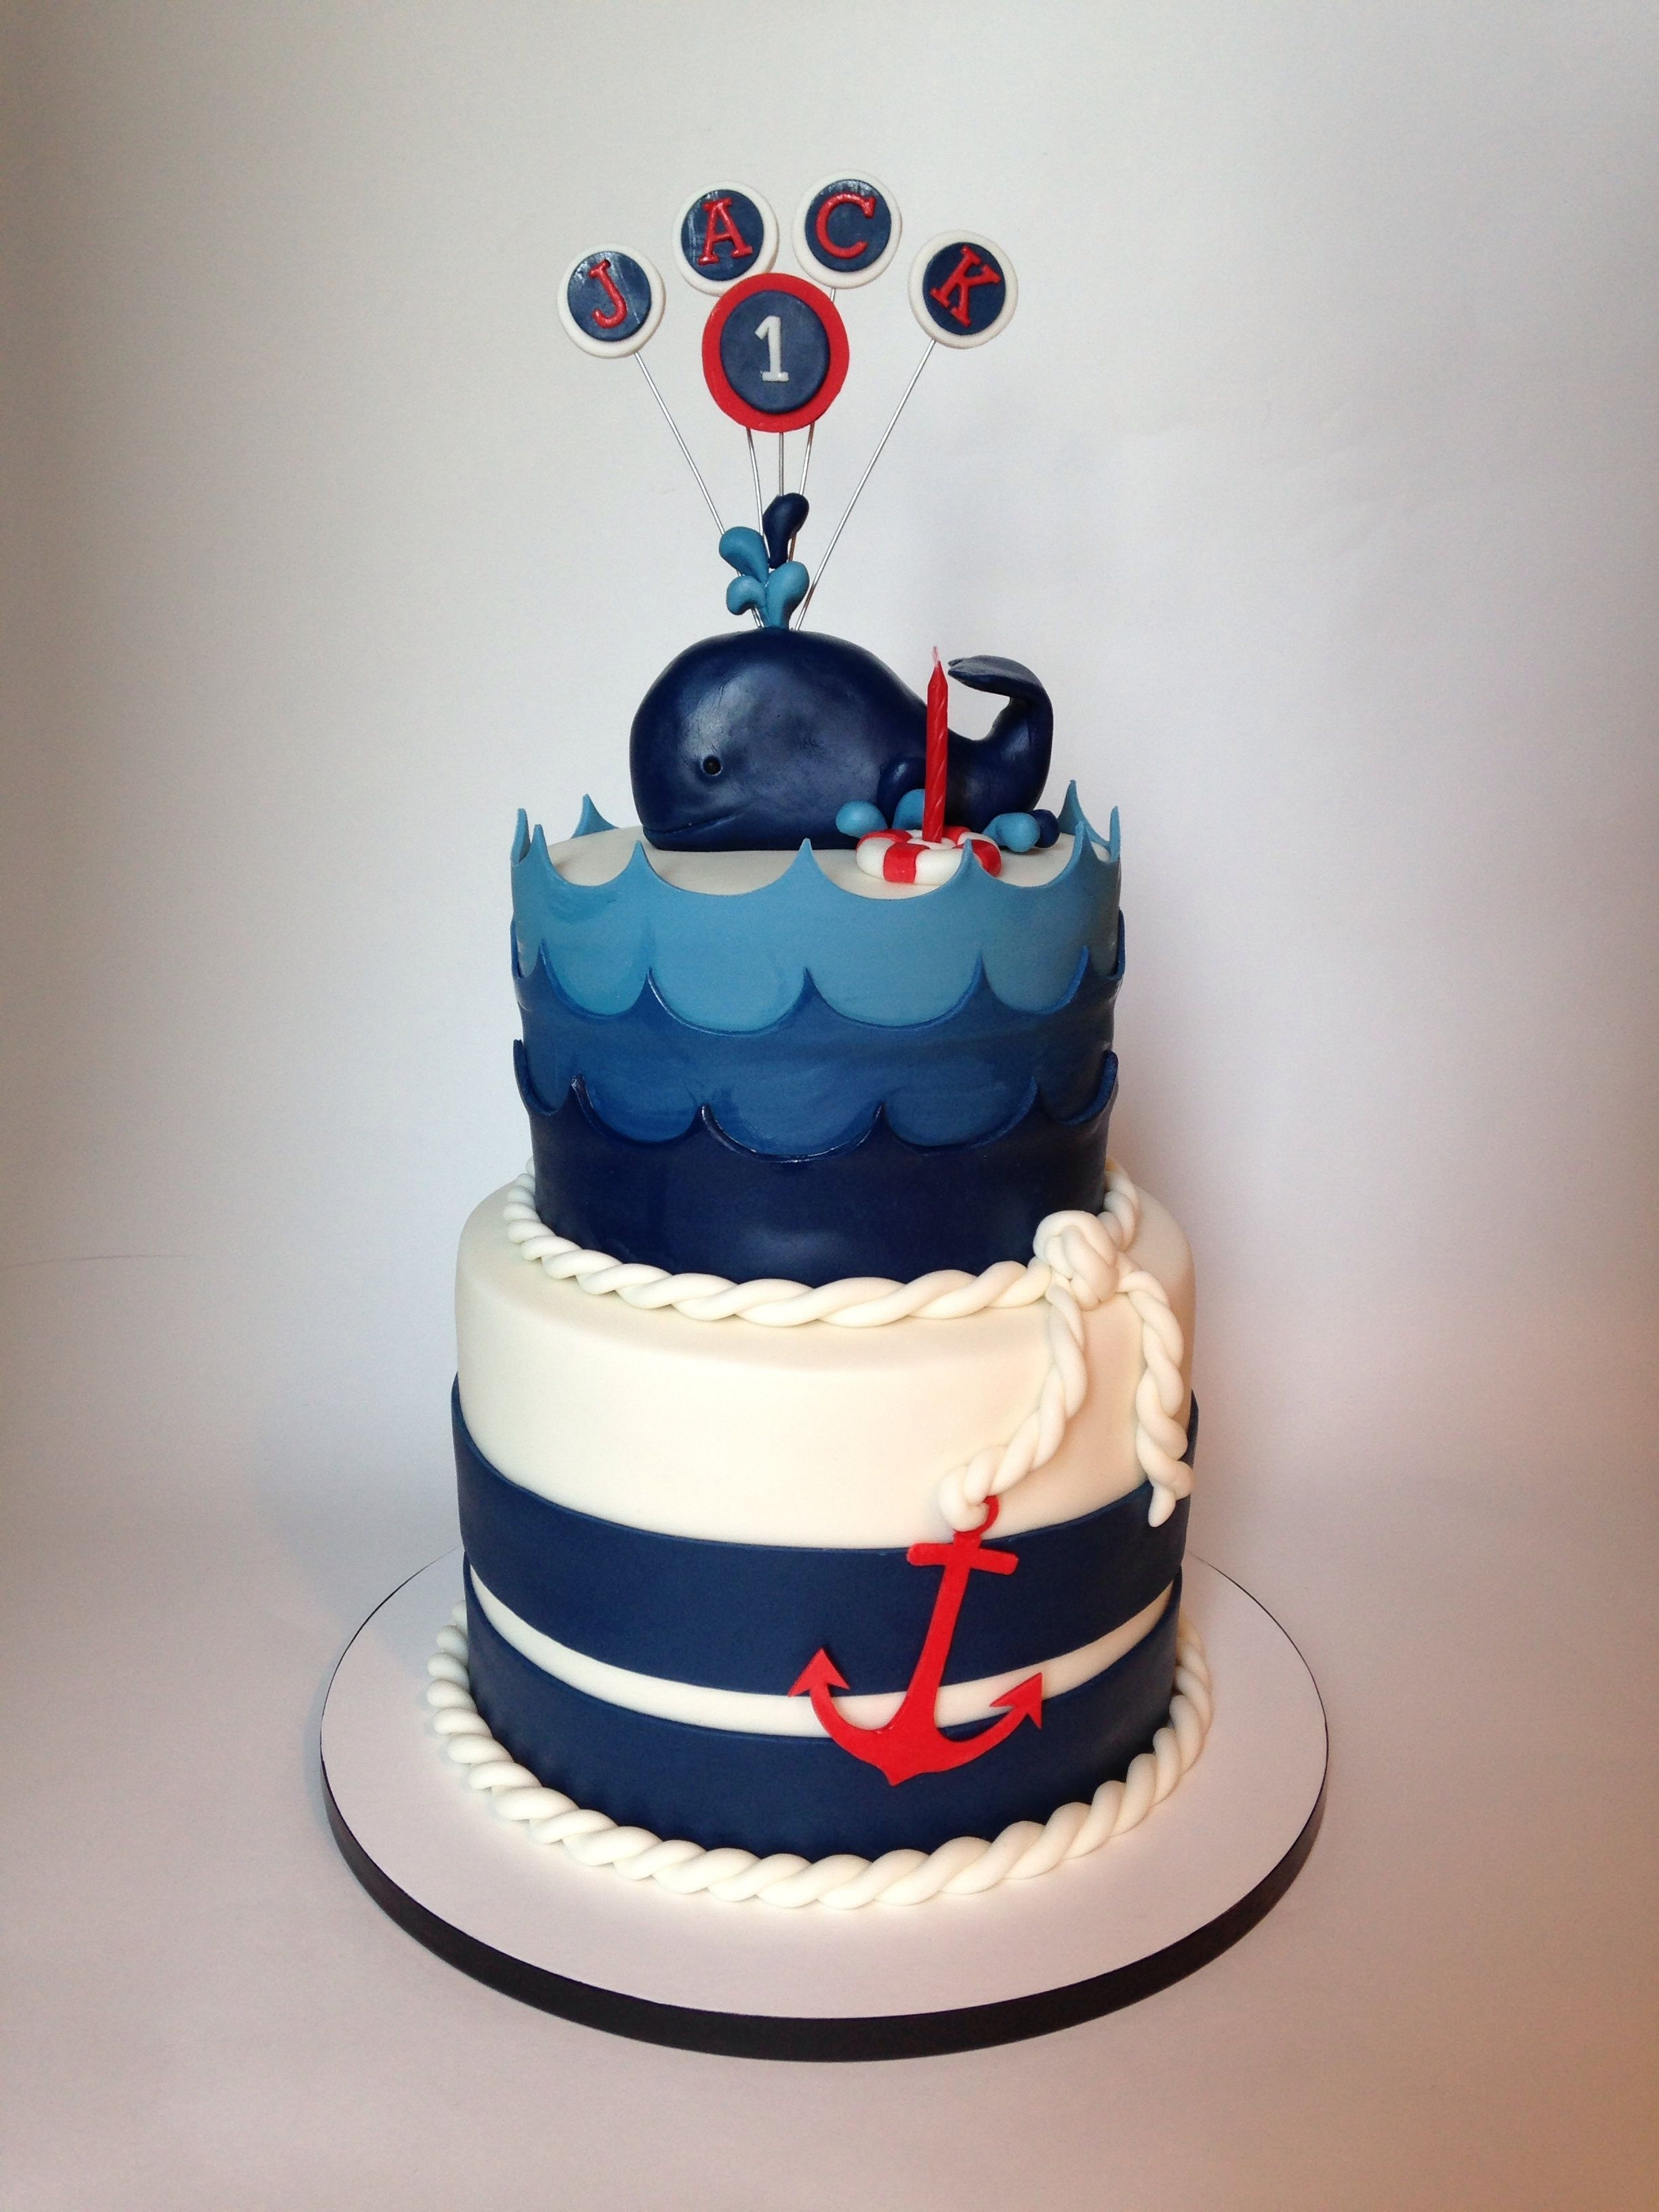 how to make a whale cake